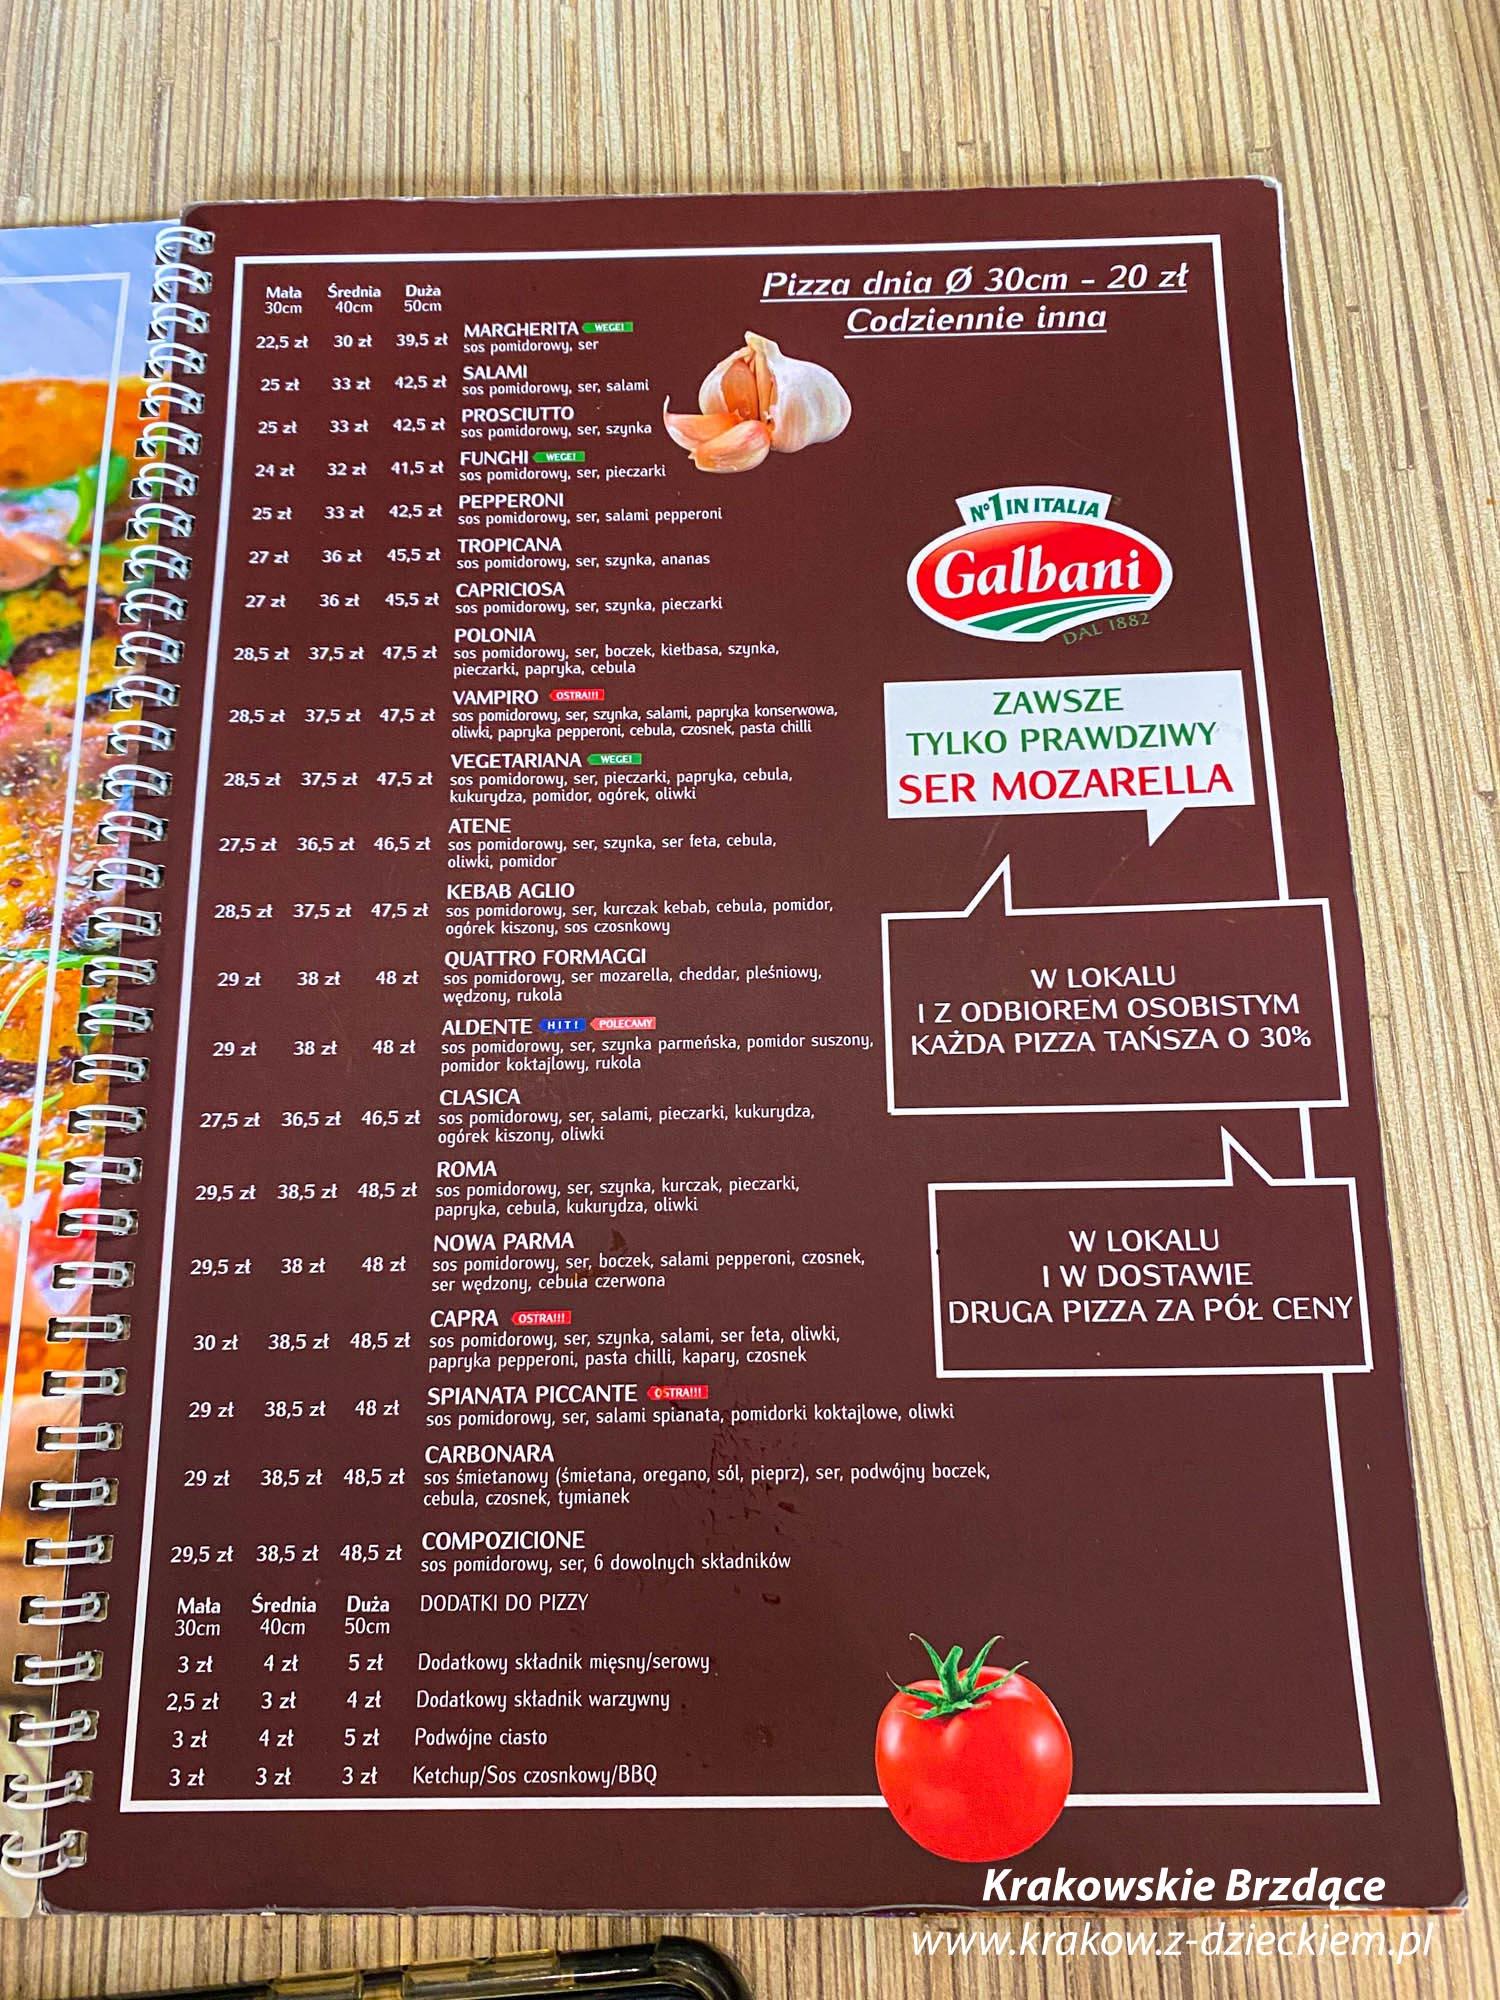 Aldente menu